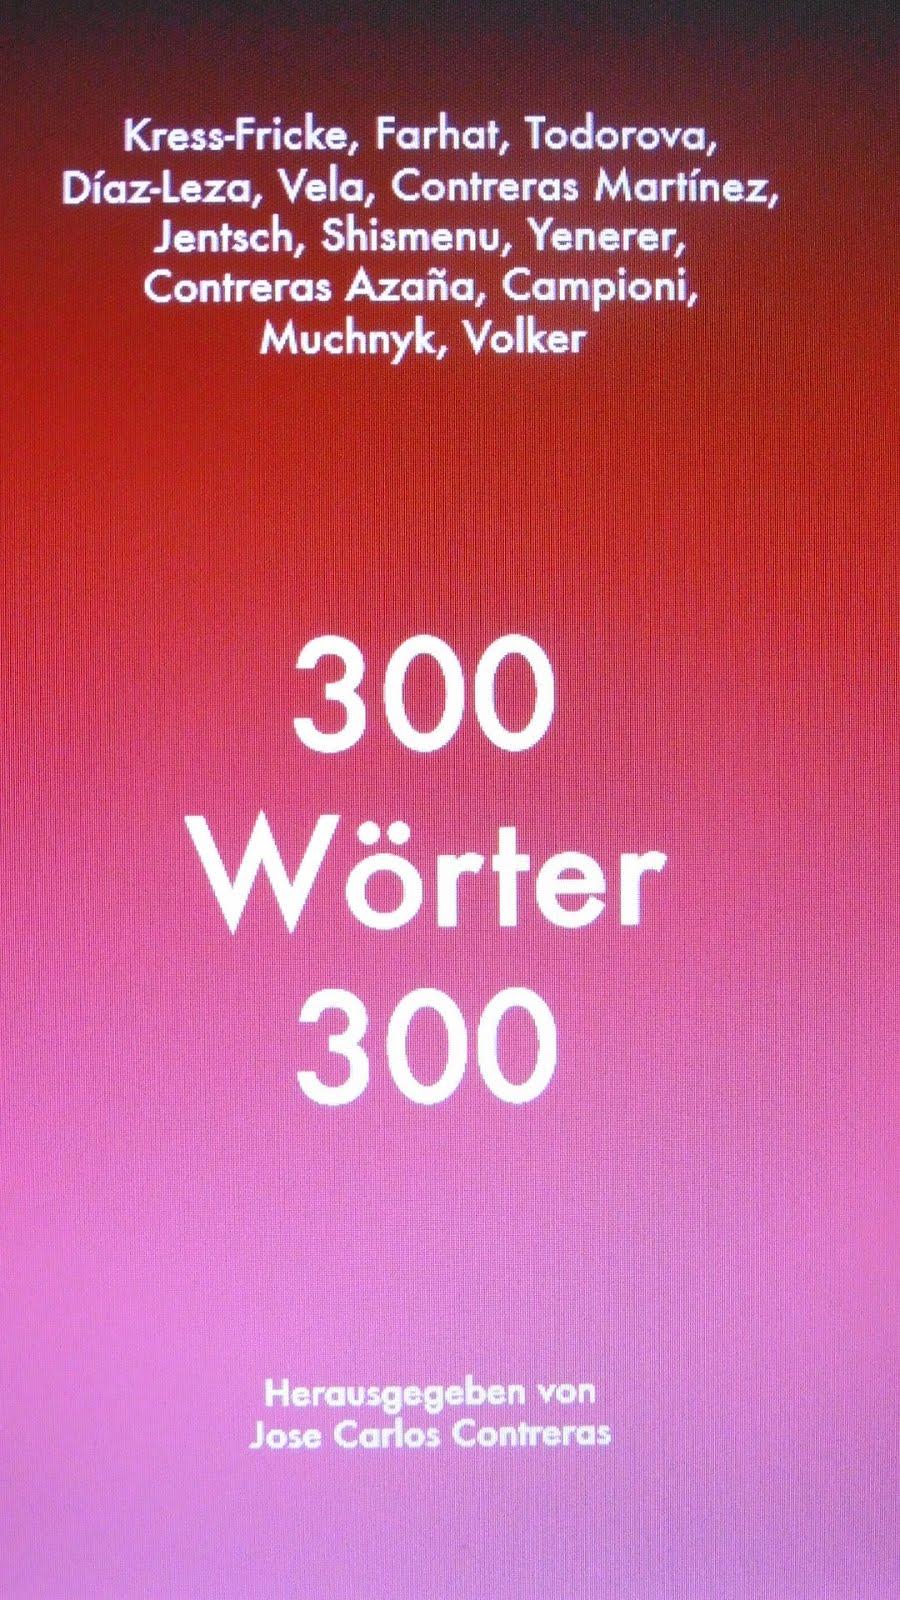 300 WÖRTER 300